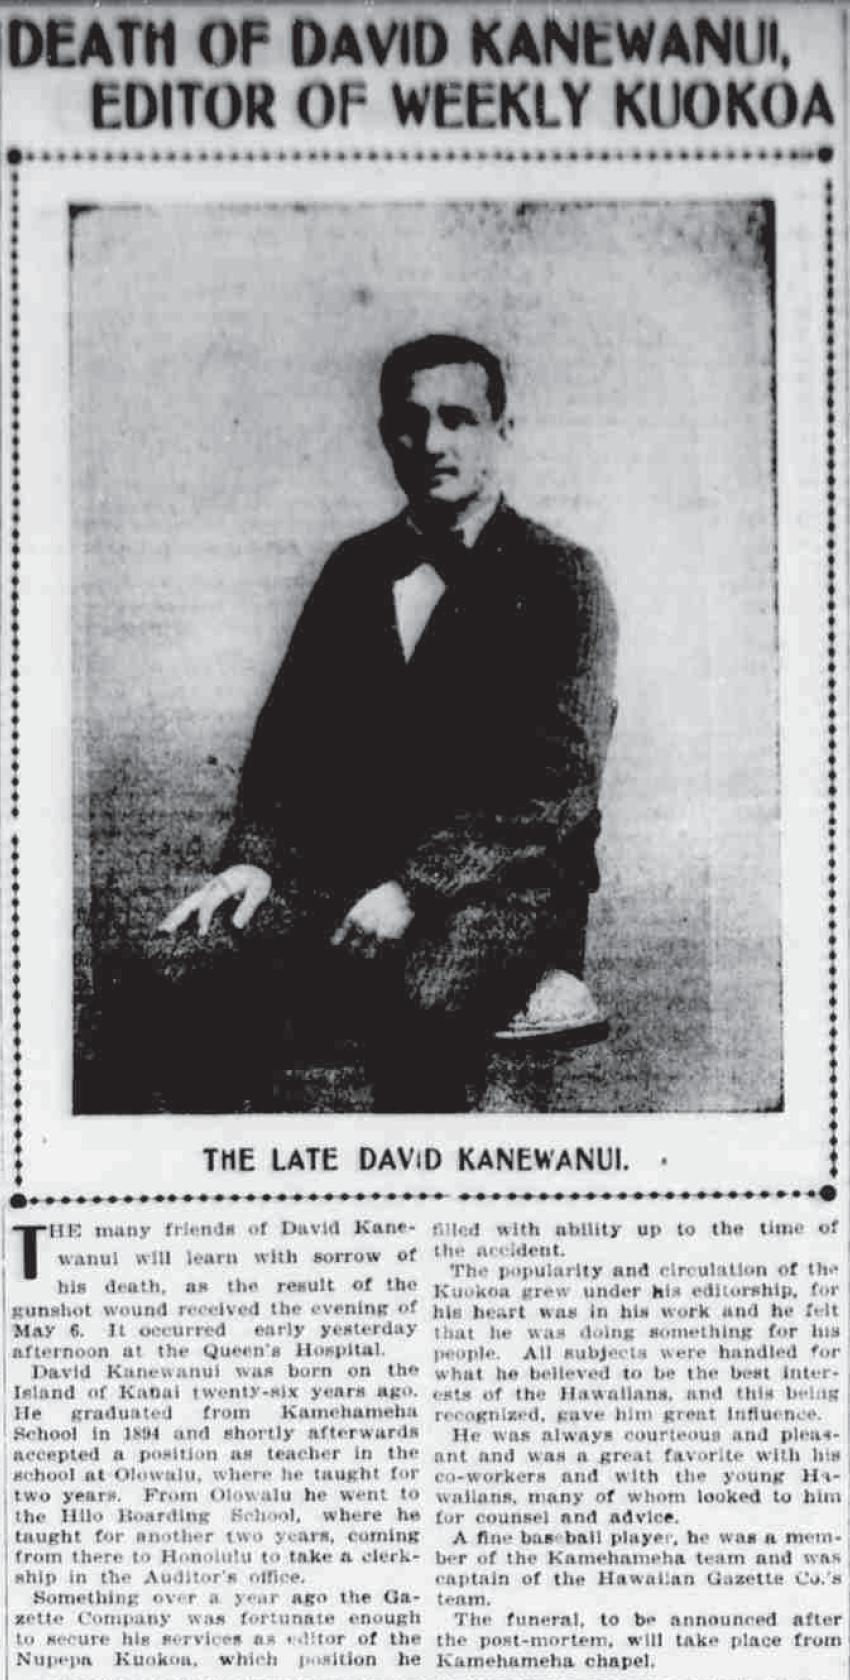 DEATH OF DAVID KANEWANUI, EDITOR OF WEEKLY KUOKOA